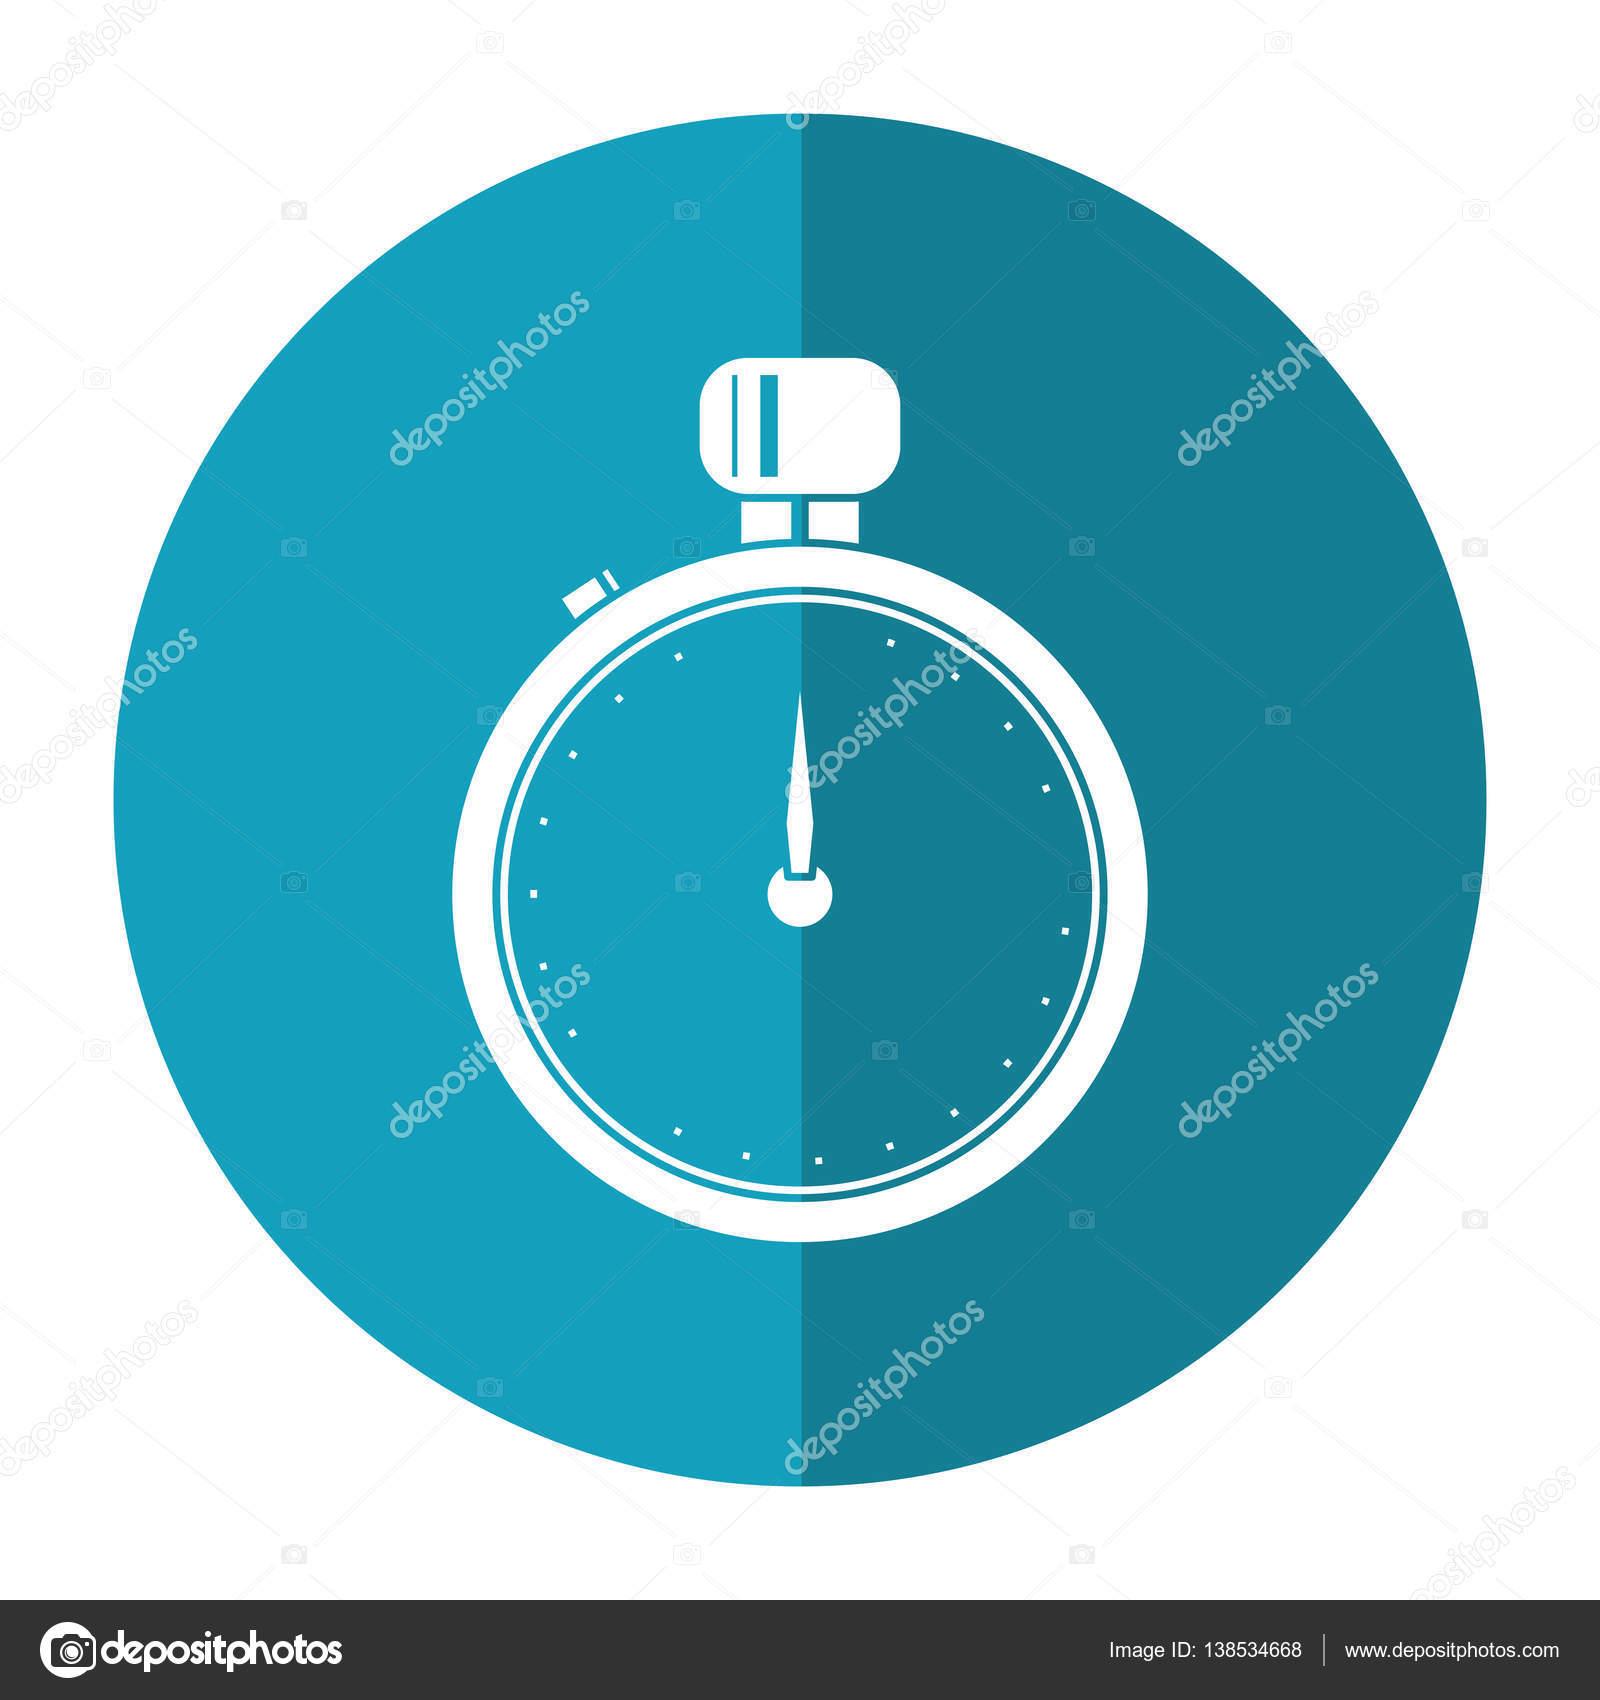 Sports Stopwatch Diagram Best Electrical Circuit Wiring Chronometer Sport Equipment Shadow Stock Vector Rh Depositphotos Com Mark 1 Automatic Watch